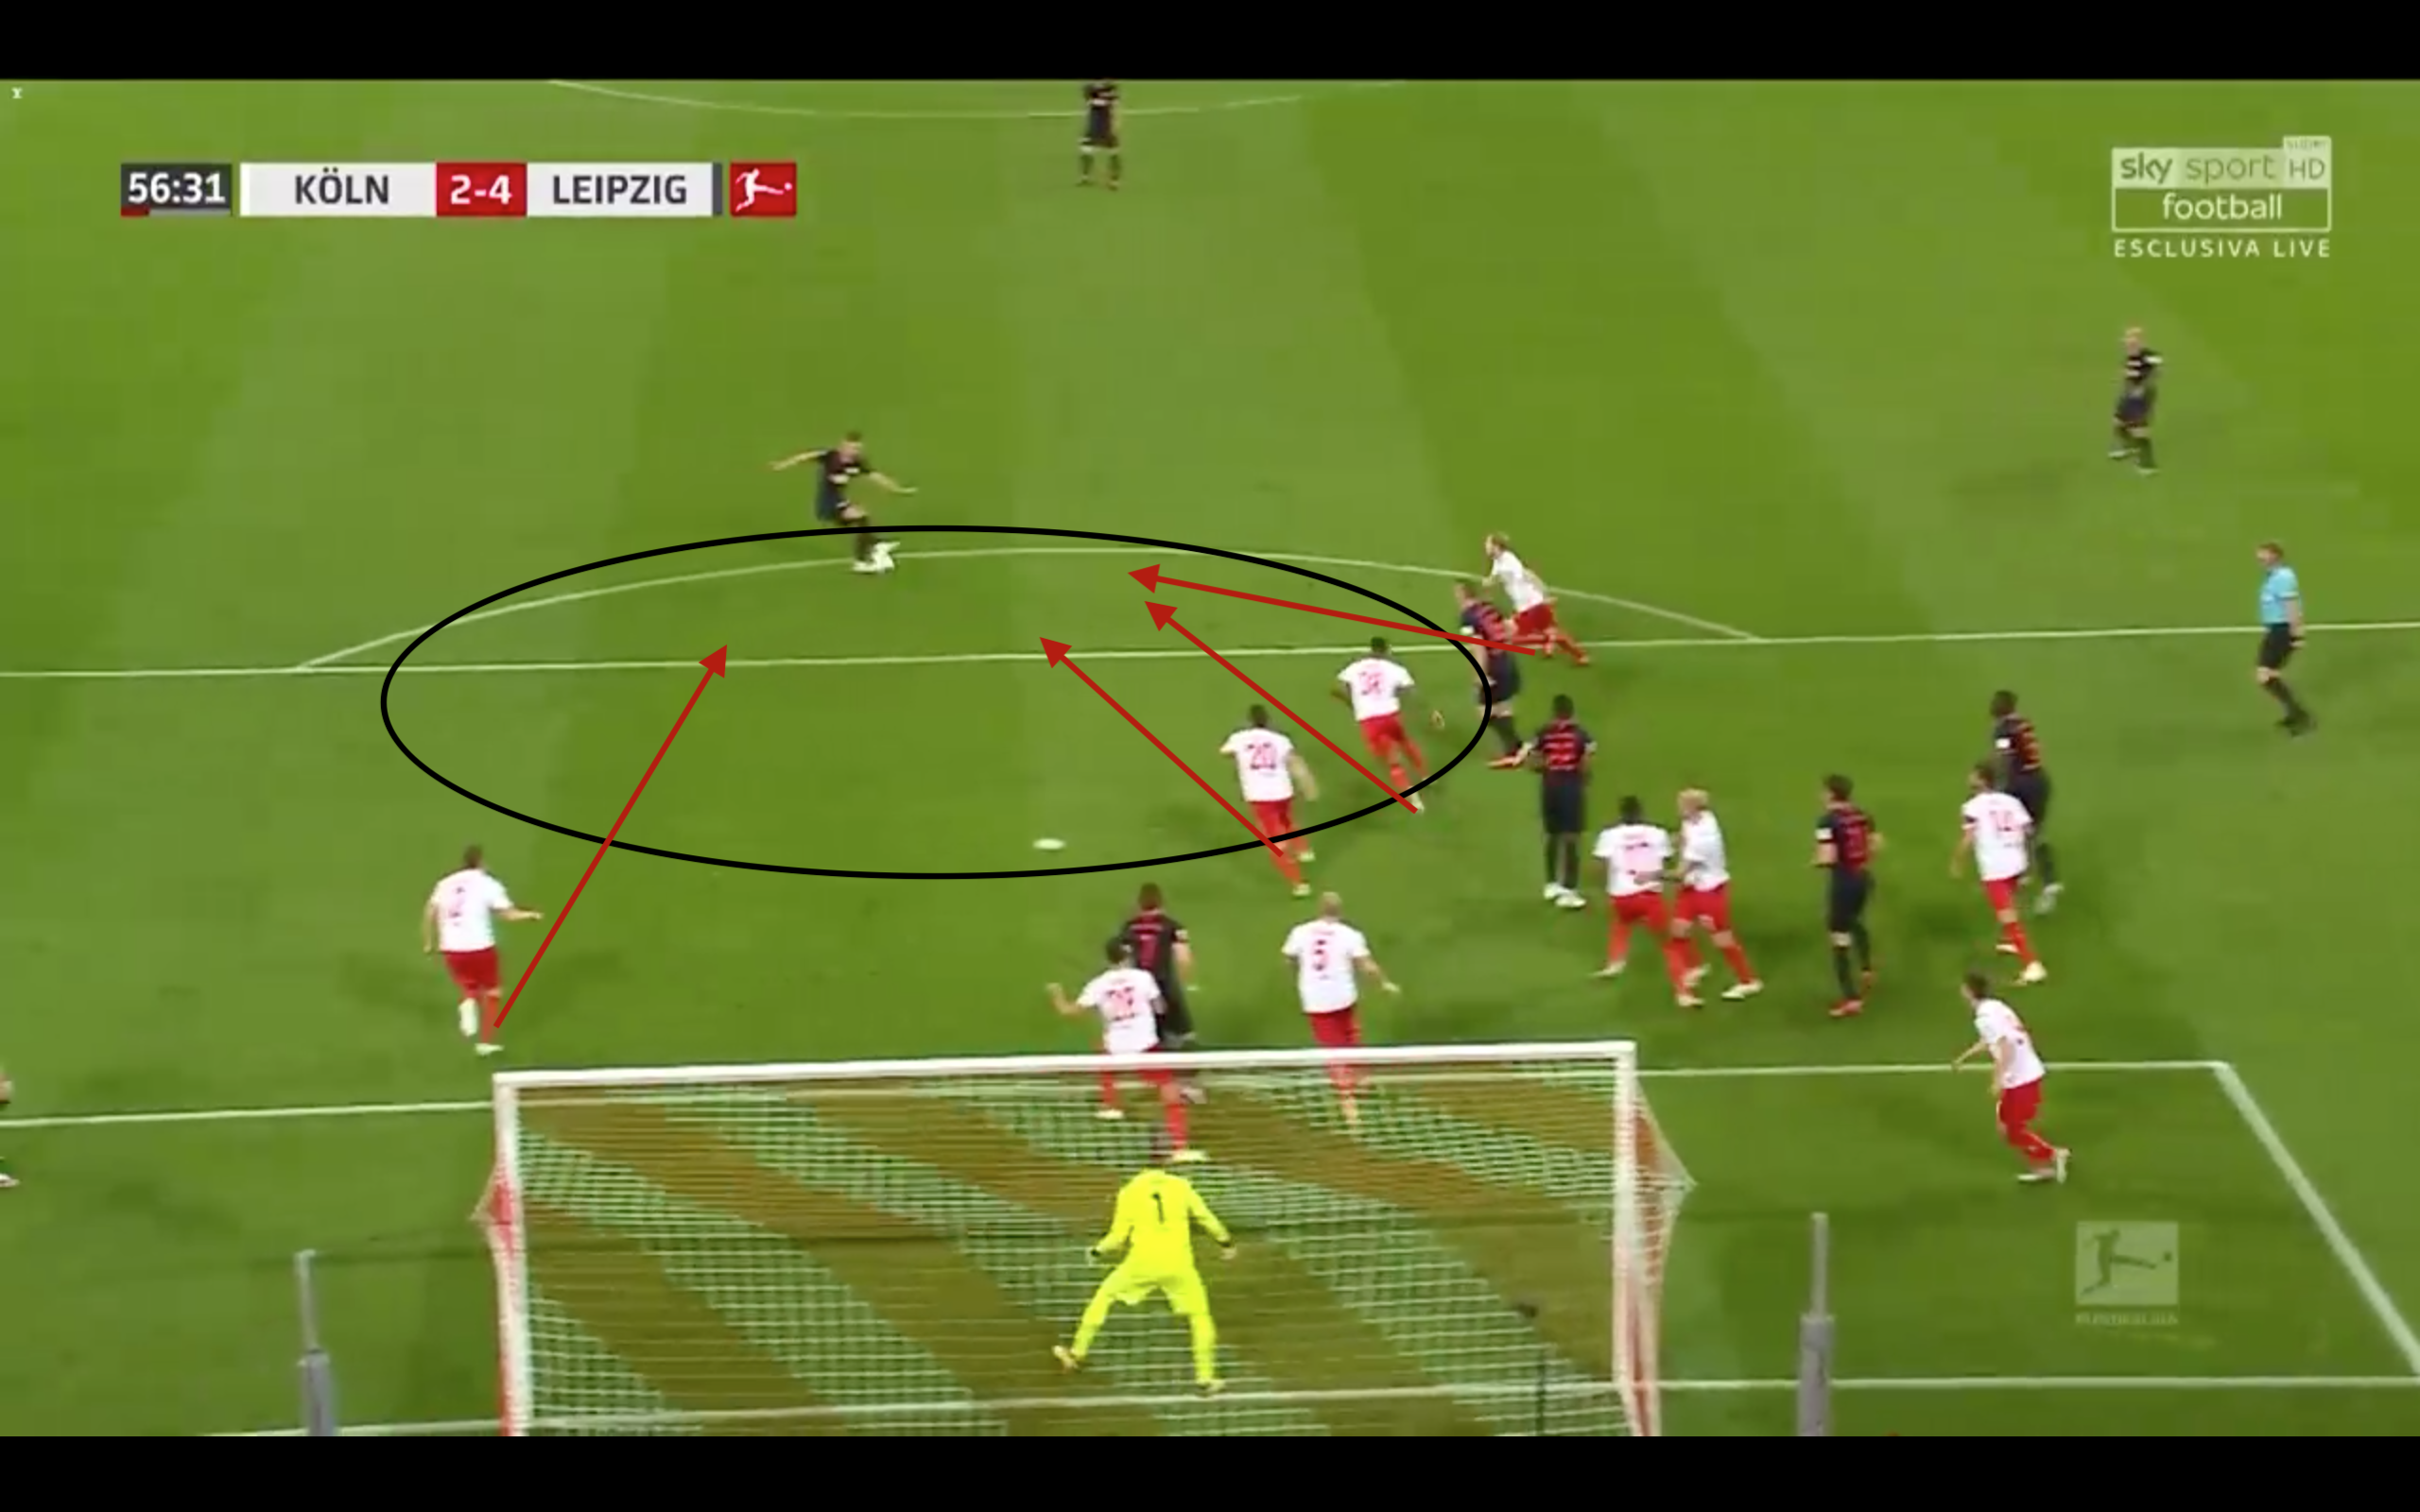 Bundesliga 2019/20: Köln vs RB Leipzig - tactical analysis tactics